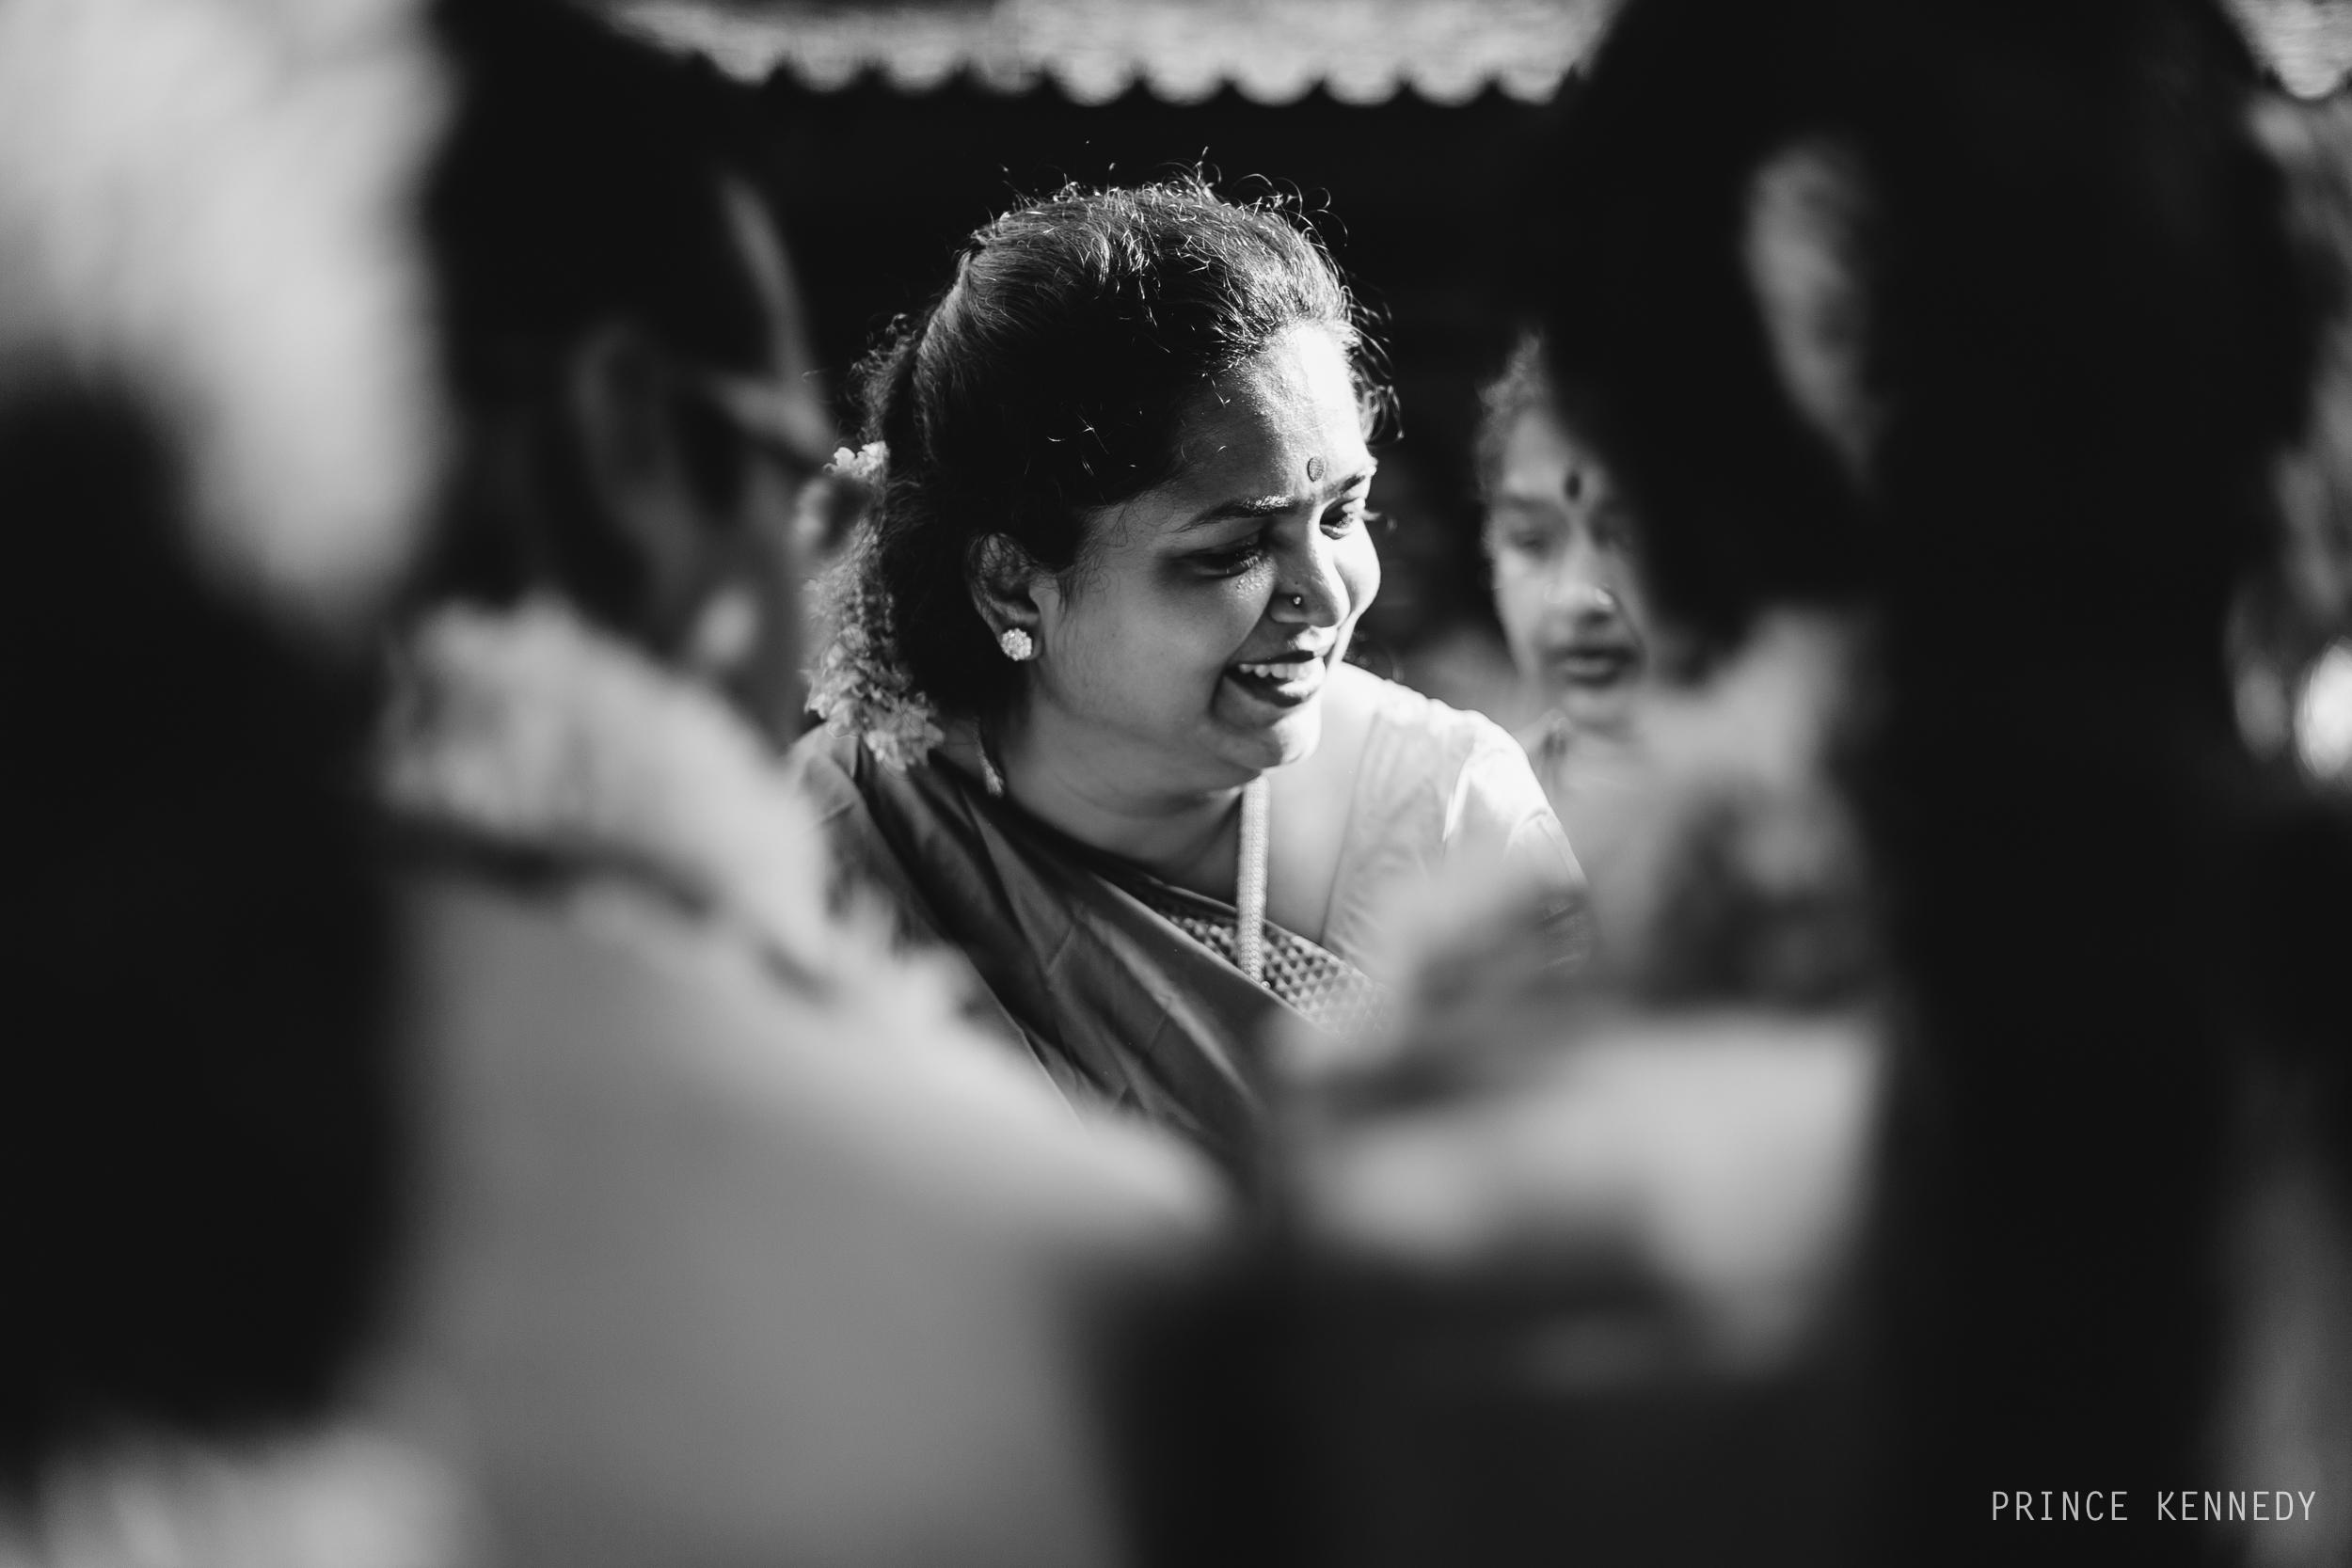 Athmajja-Nithesh-Engagement-Couple-Portrait-Portraiture-Wedding-Couple-Portrait-Chennai-Photographer-Candid-Photography-Destination-Best-Prince-Kennedy-Photography-126.jpg